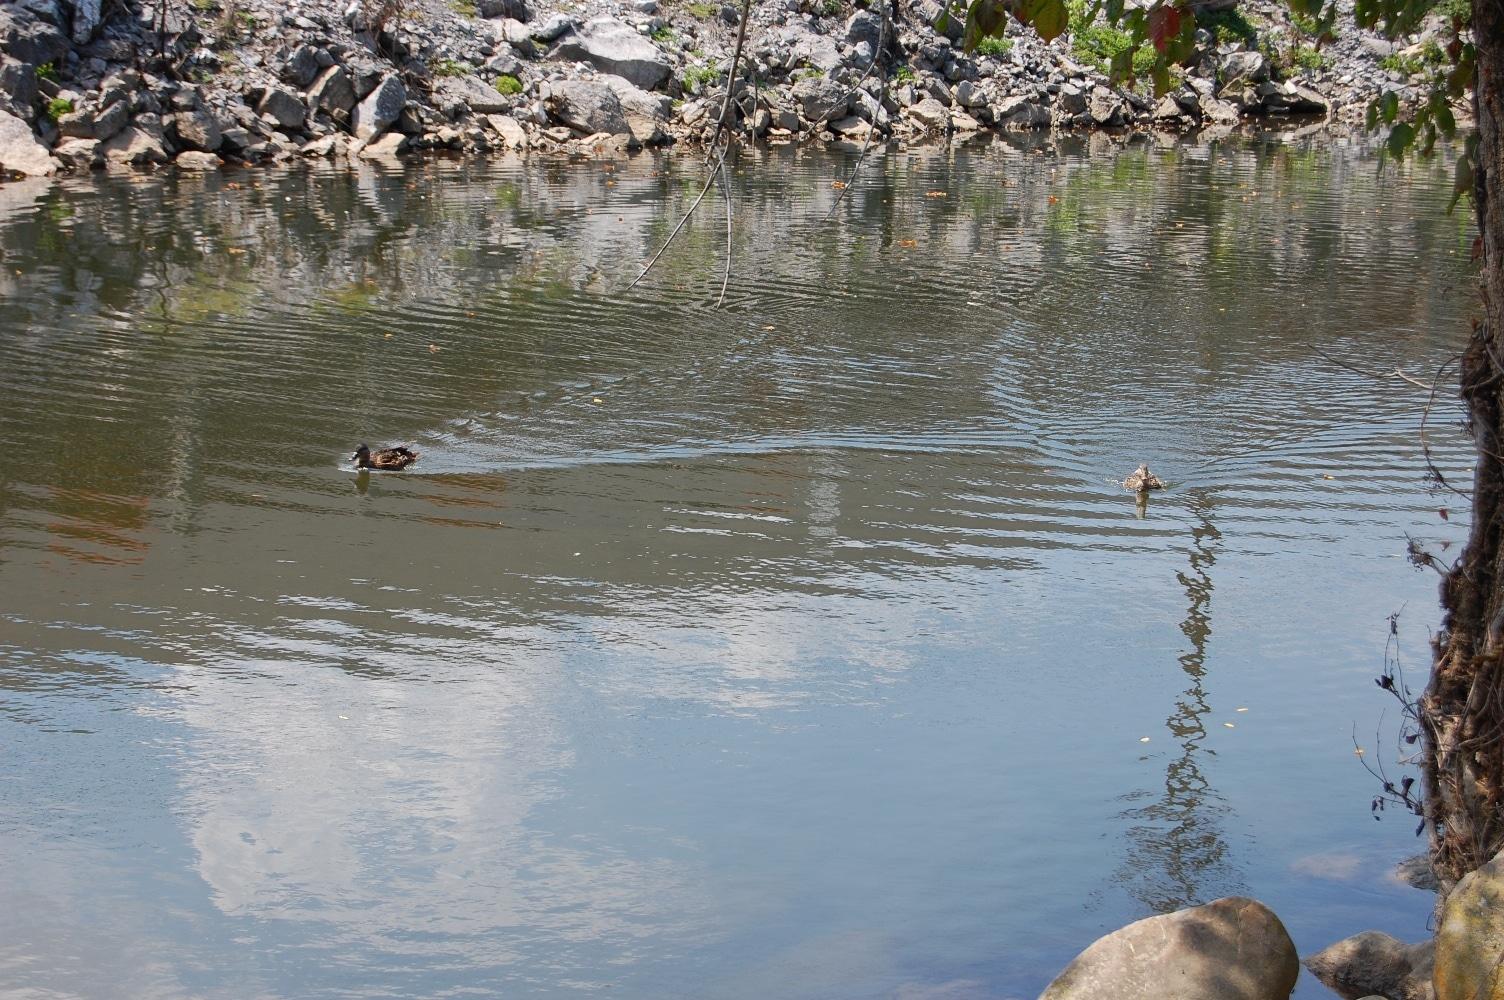 Duck little pigeon river 7-1-2014